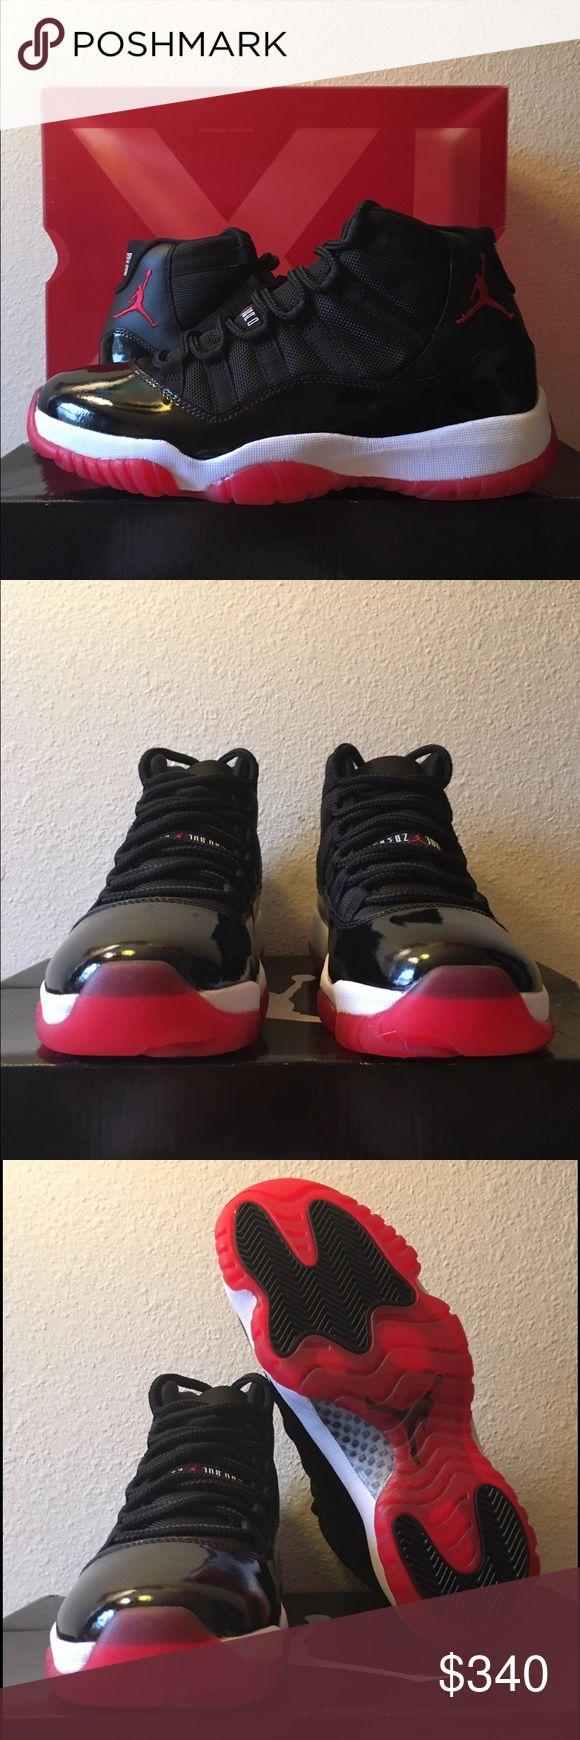 "Air Jordan Retro XI (11) ""Bred/Playoffs"" 2012 Size 8 men's, 9.5 women's / Brand new, never worn, DS / OG all Jordan Shoes Sneakers"